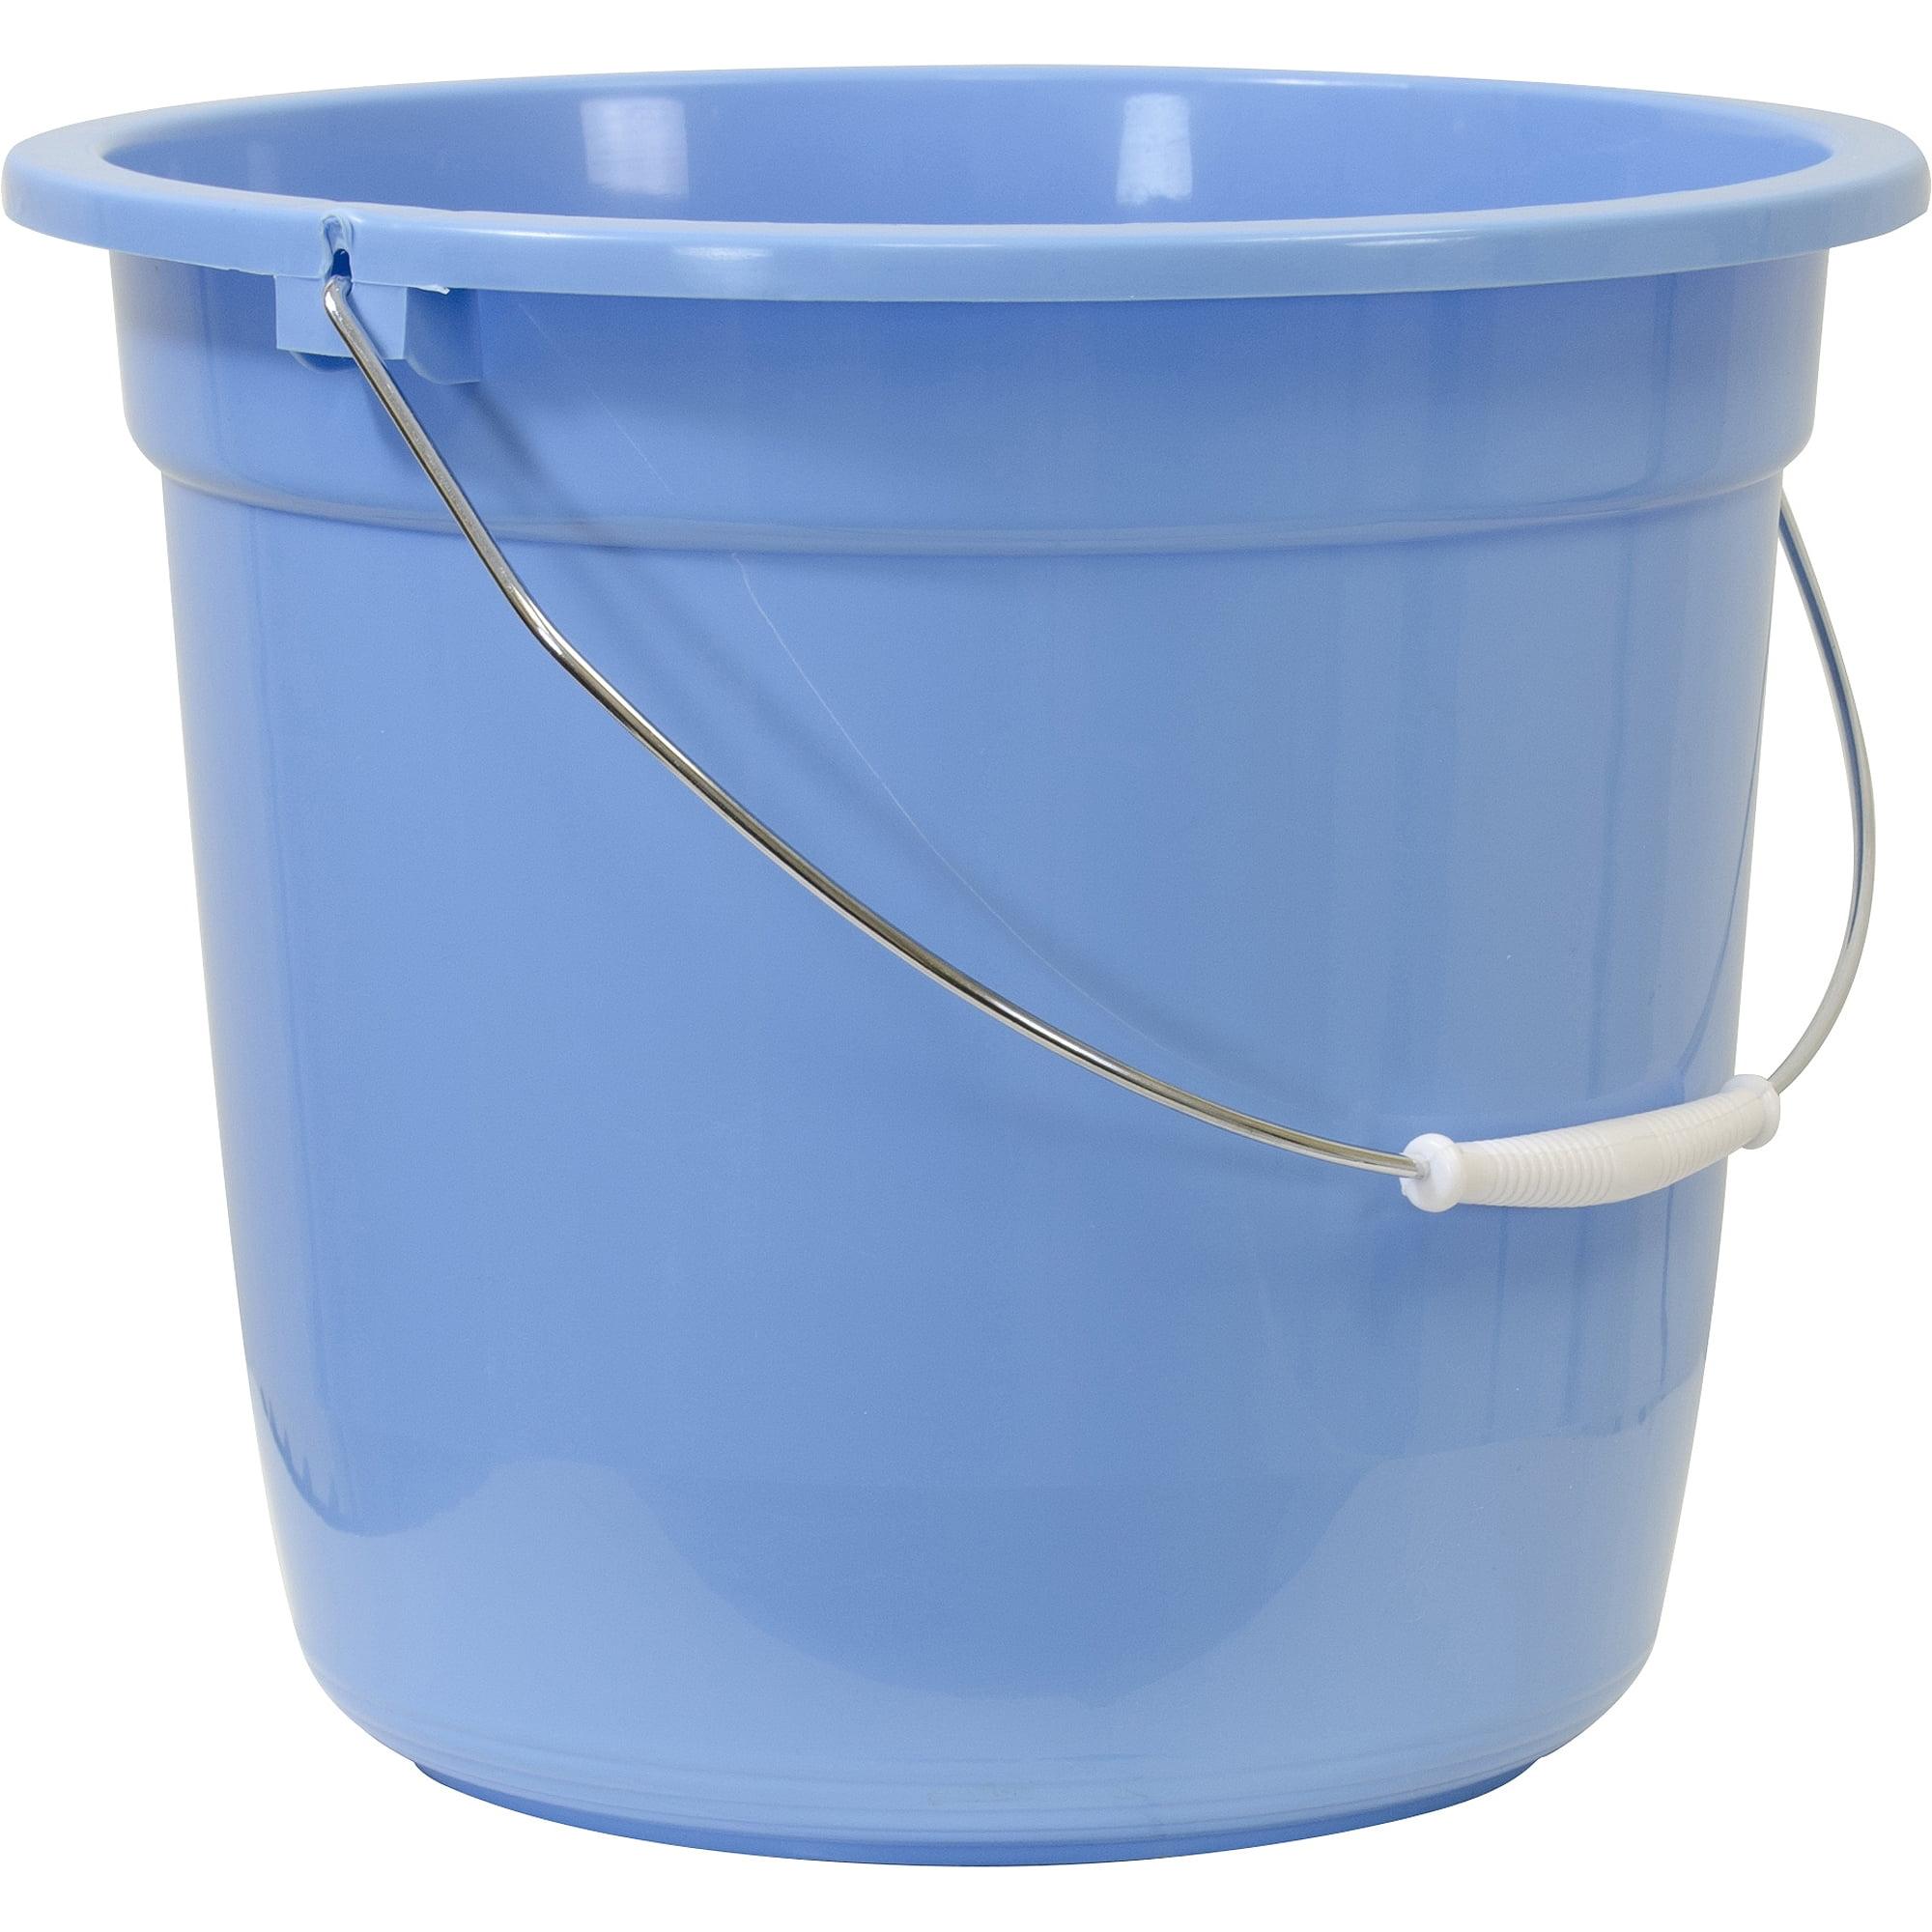 10 Gallon Plastic Bucket